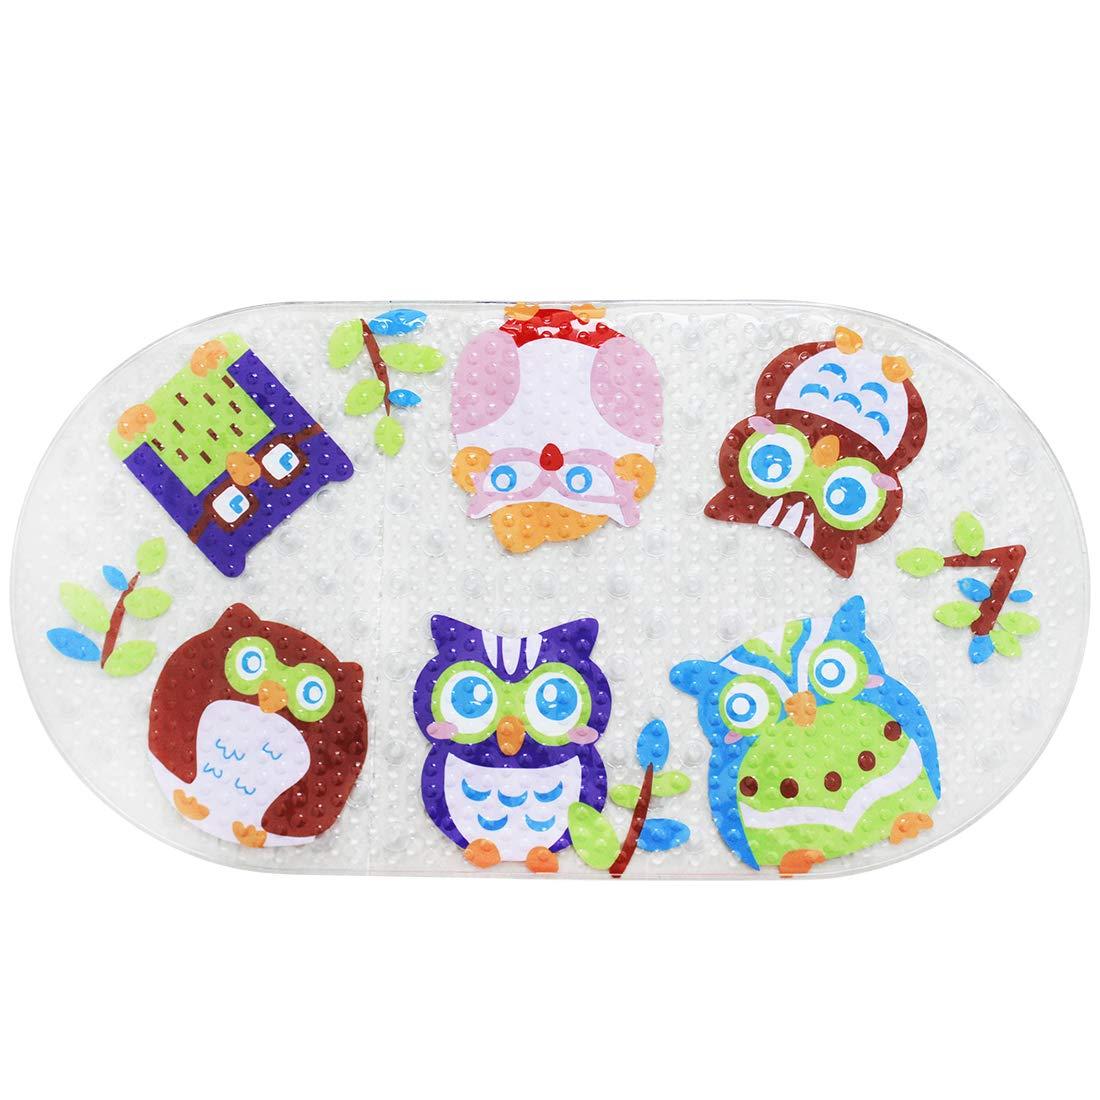 Ainko Kids No-Slip Bath Mat for Tub Baby Anti-Slip Shower Mat,Cool Slip Resistant Bathroom Floor Bathtub Mats Lulutus